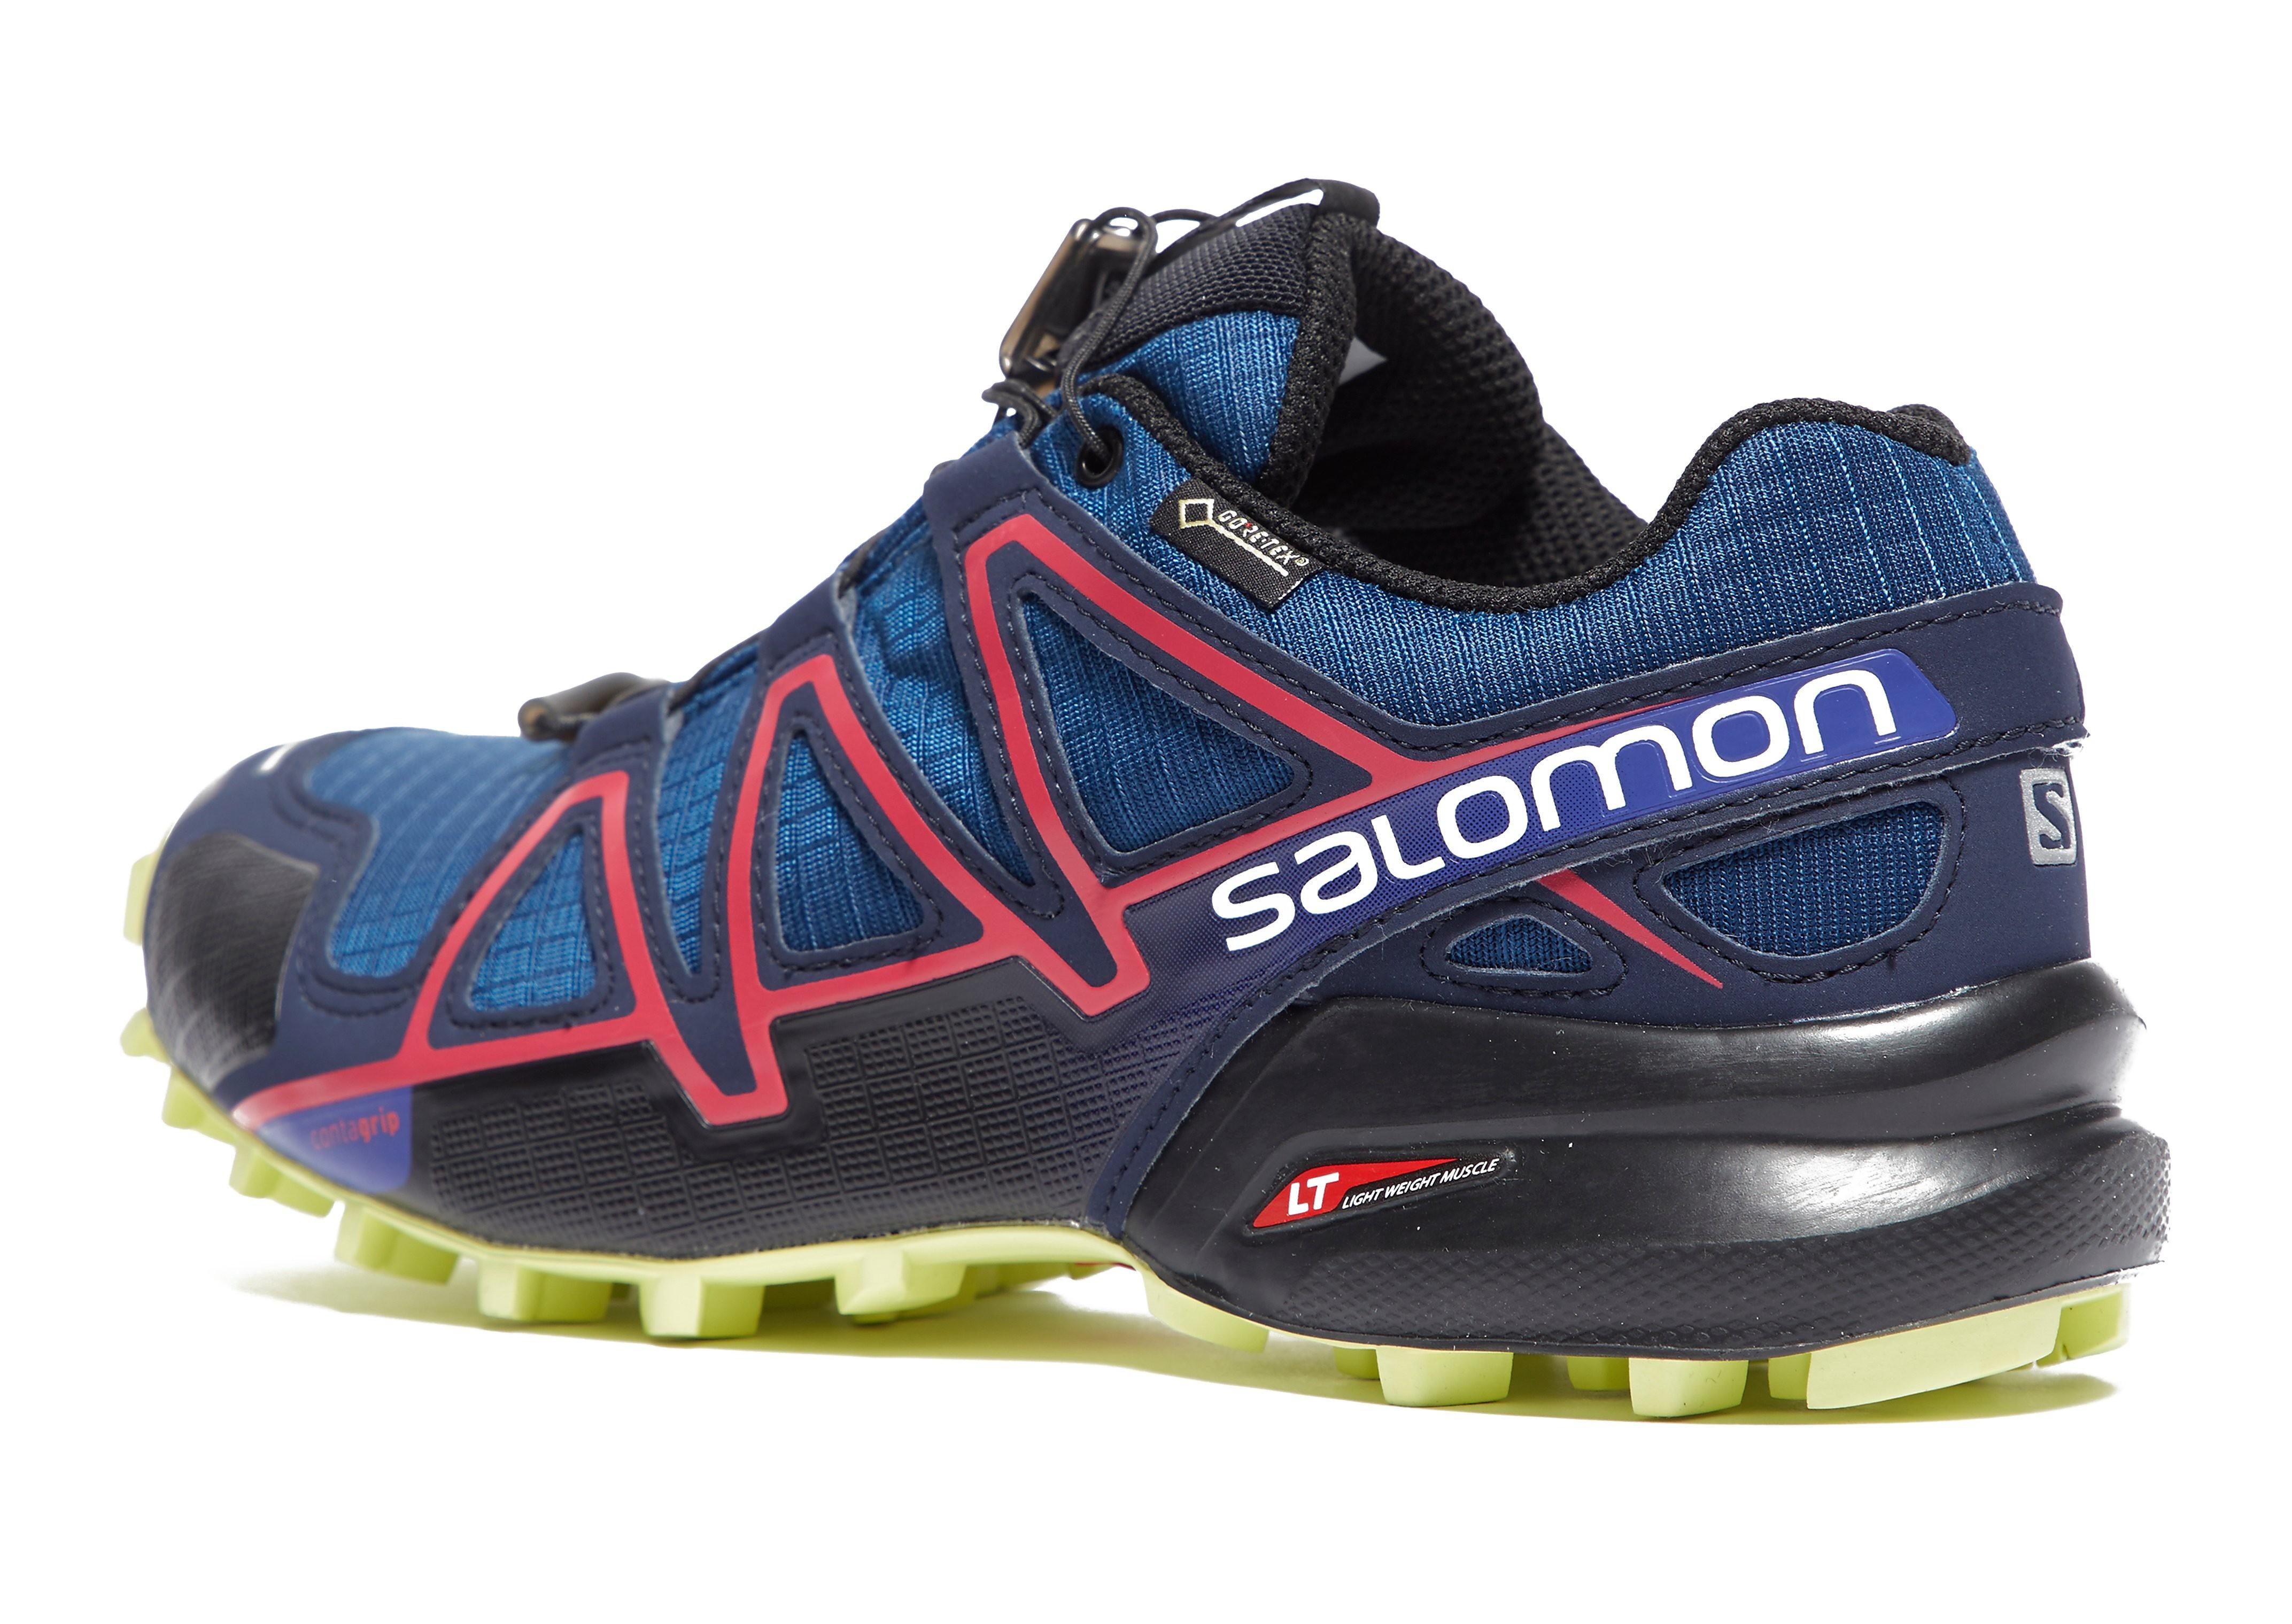 Salomon Speedcross 4 GTX Women's